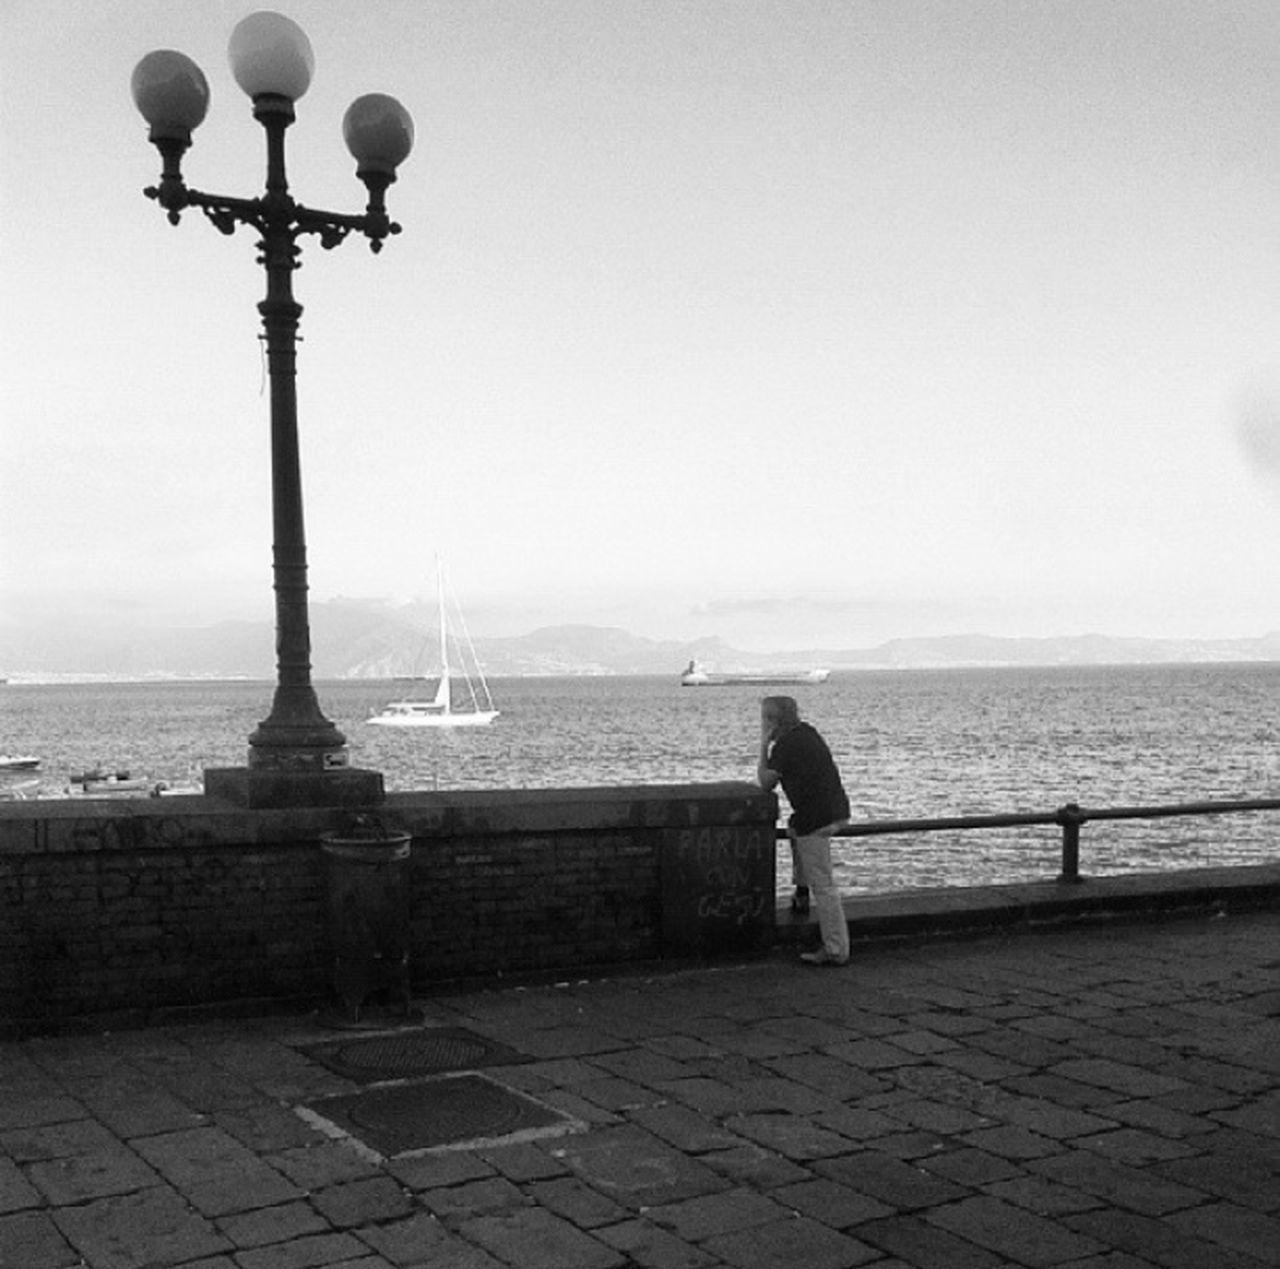 Napoli Napolipix Napoliphotoproject Napoli ❤ Napoli Street Napoli Italy Napoli_da Napolinstagram Napolimylife Napoliproject Napolidavivere Napoli_foto